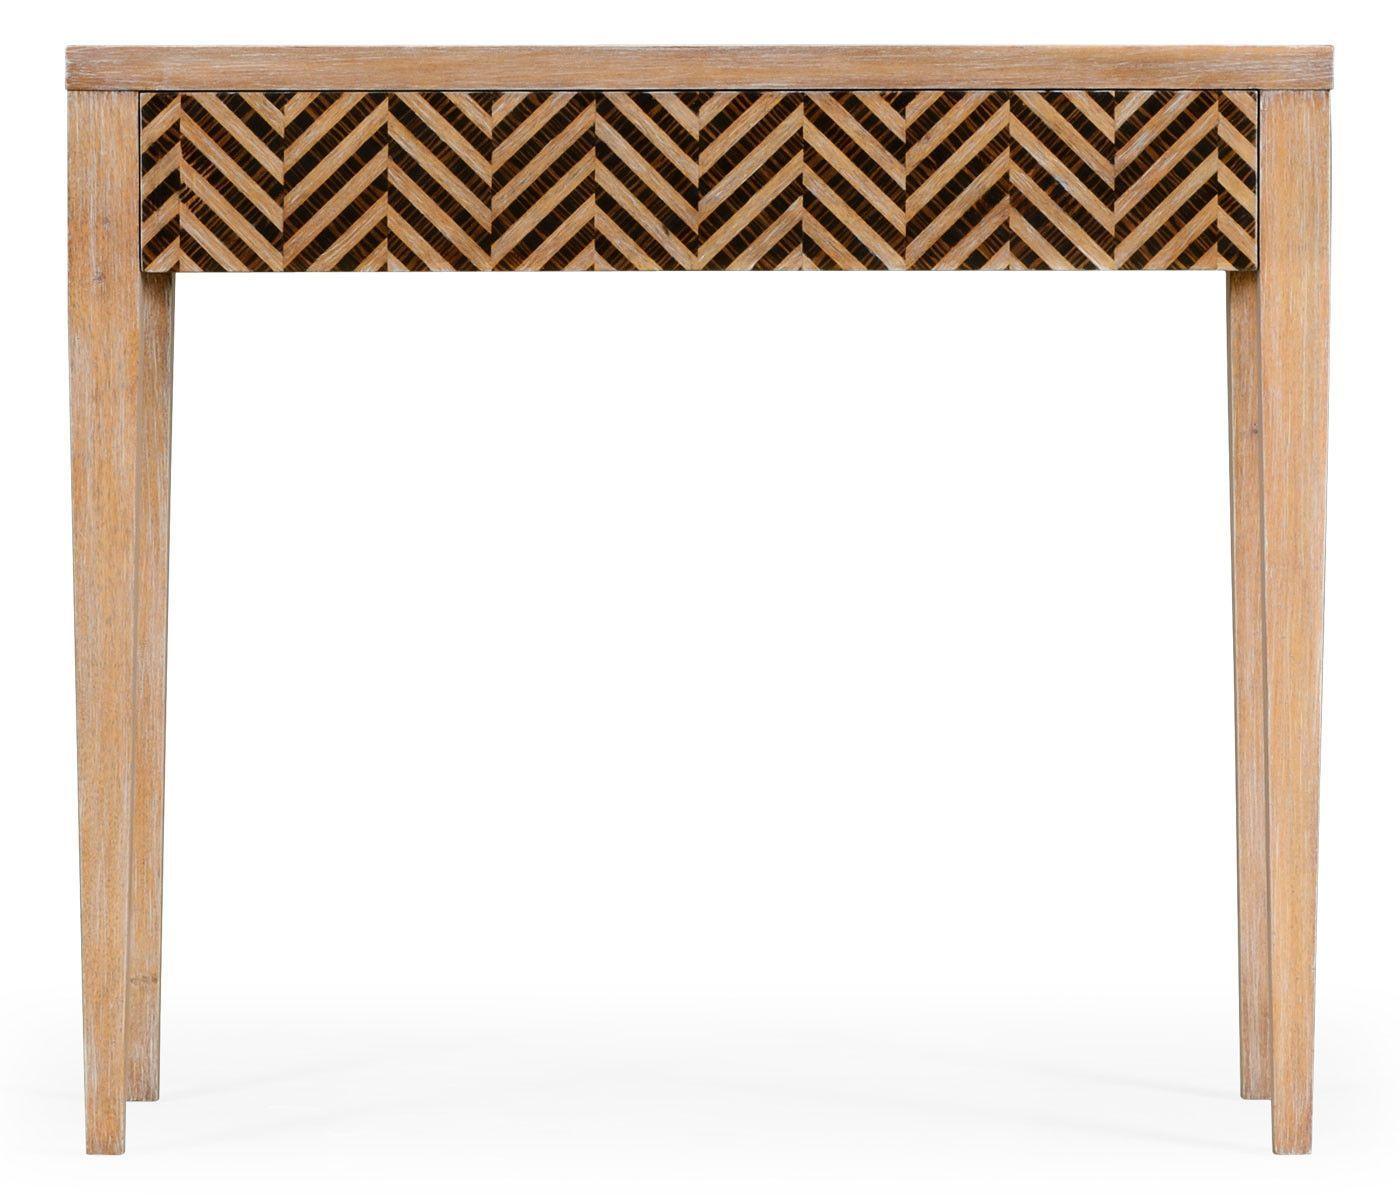 Jonathan Charles Classic Julian Herringbone Console Tan Tweed Brilliant Alexander Julian Dining Room Furniture Design Inspiration